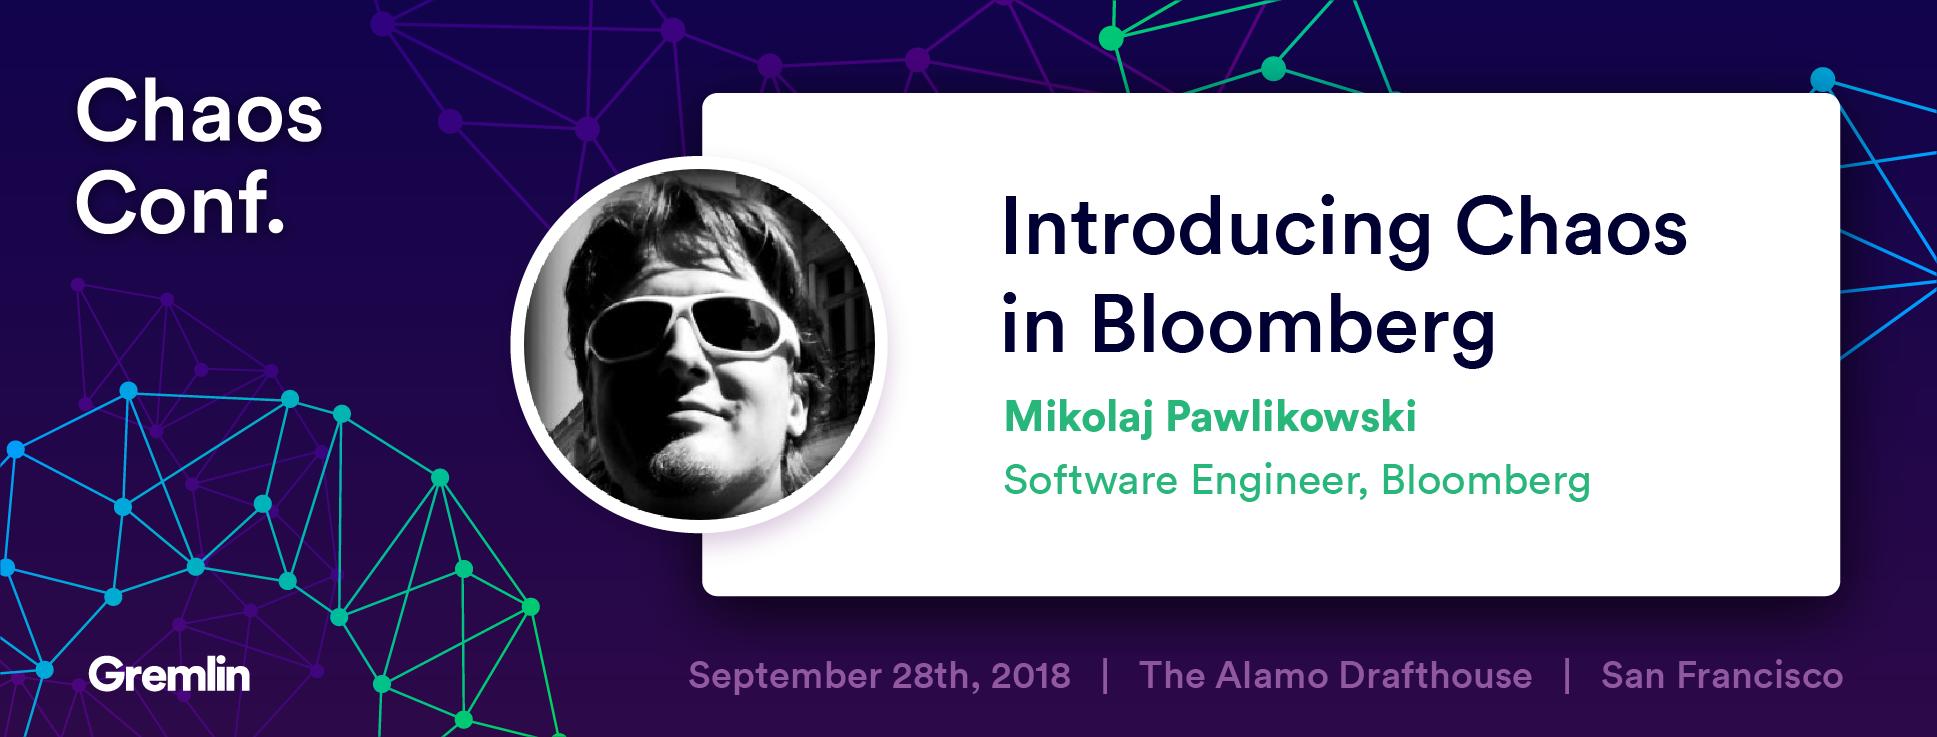 "Mikolaj Pawlikowski: ""Introducing Chaos in Bloomberg"" - Chaos Conf 2018"